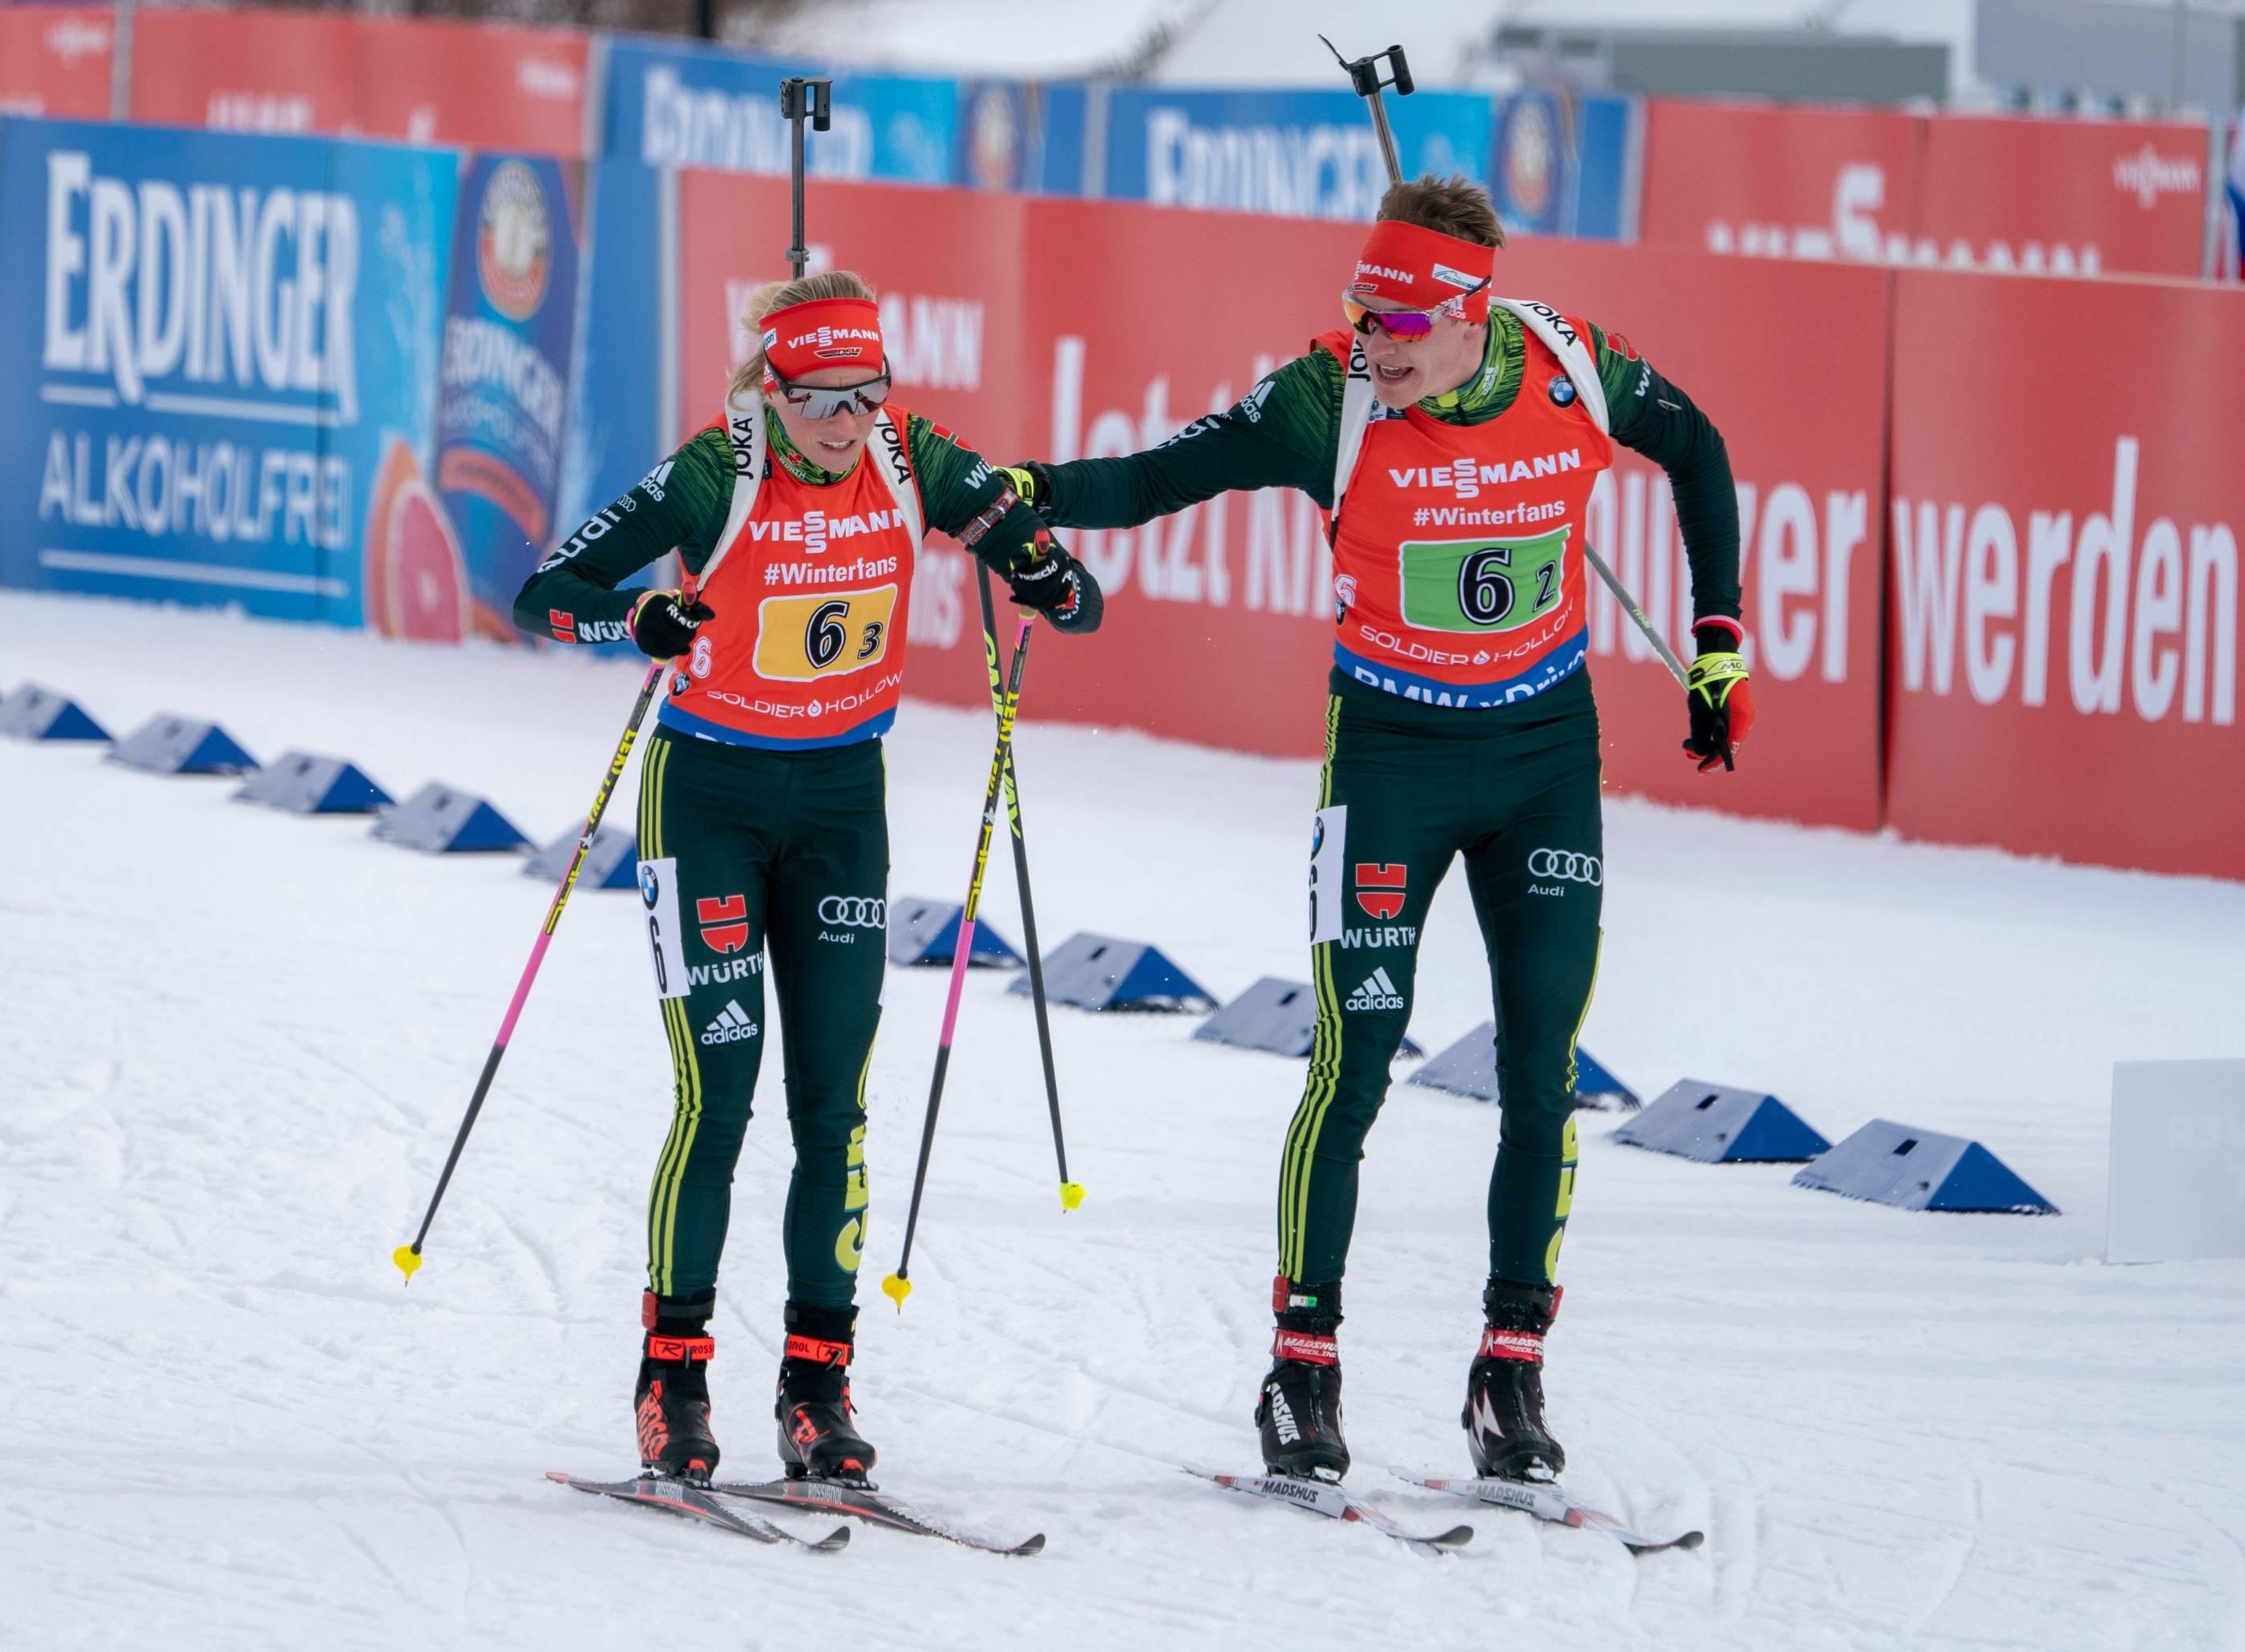 biathlon wm 2019 zeitplan